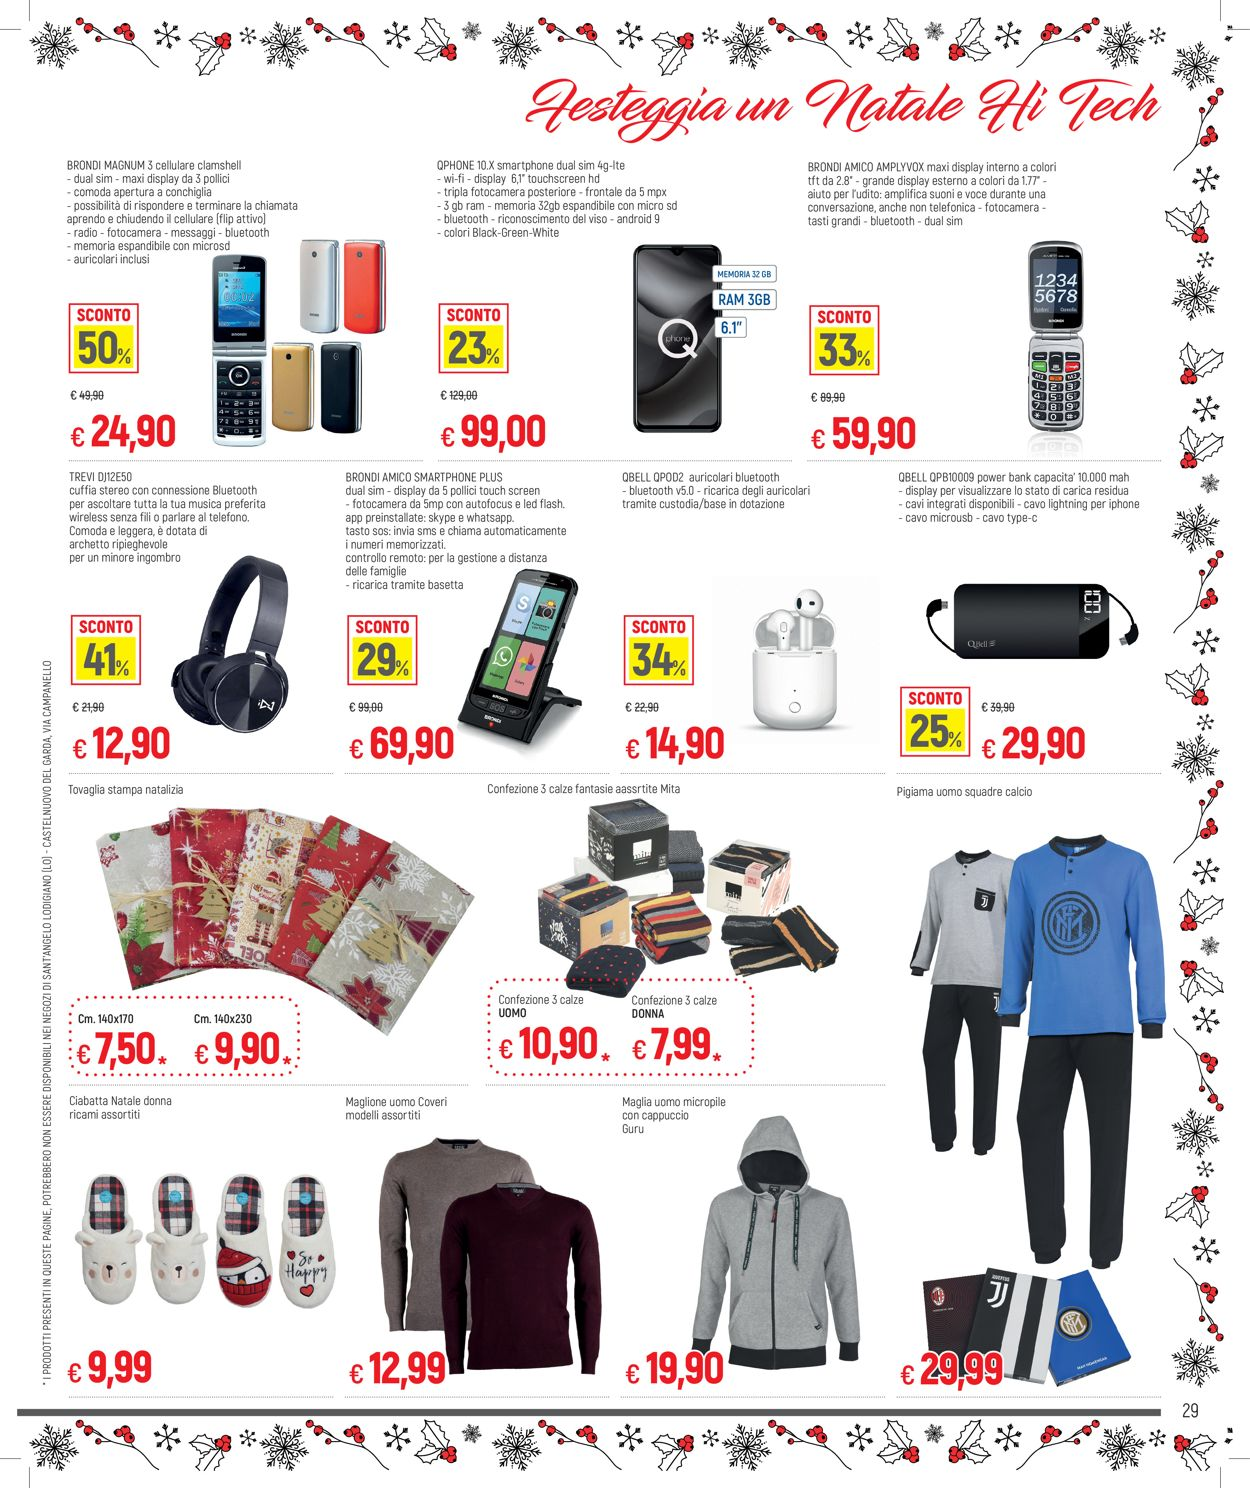 Volantino Famila - Natale 2020 - Offerte 14/12-31/12/2020 (Pagina 29)